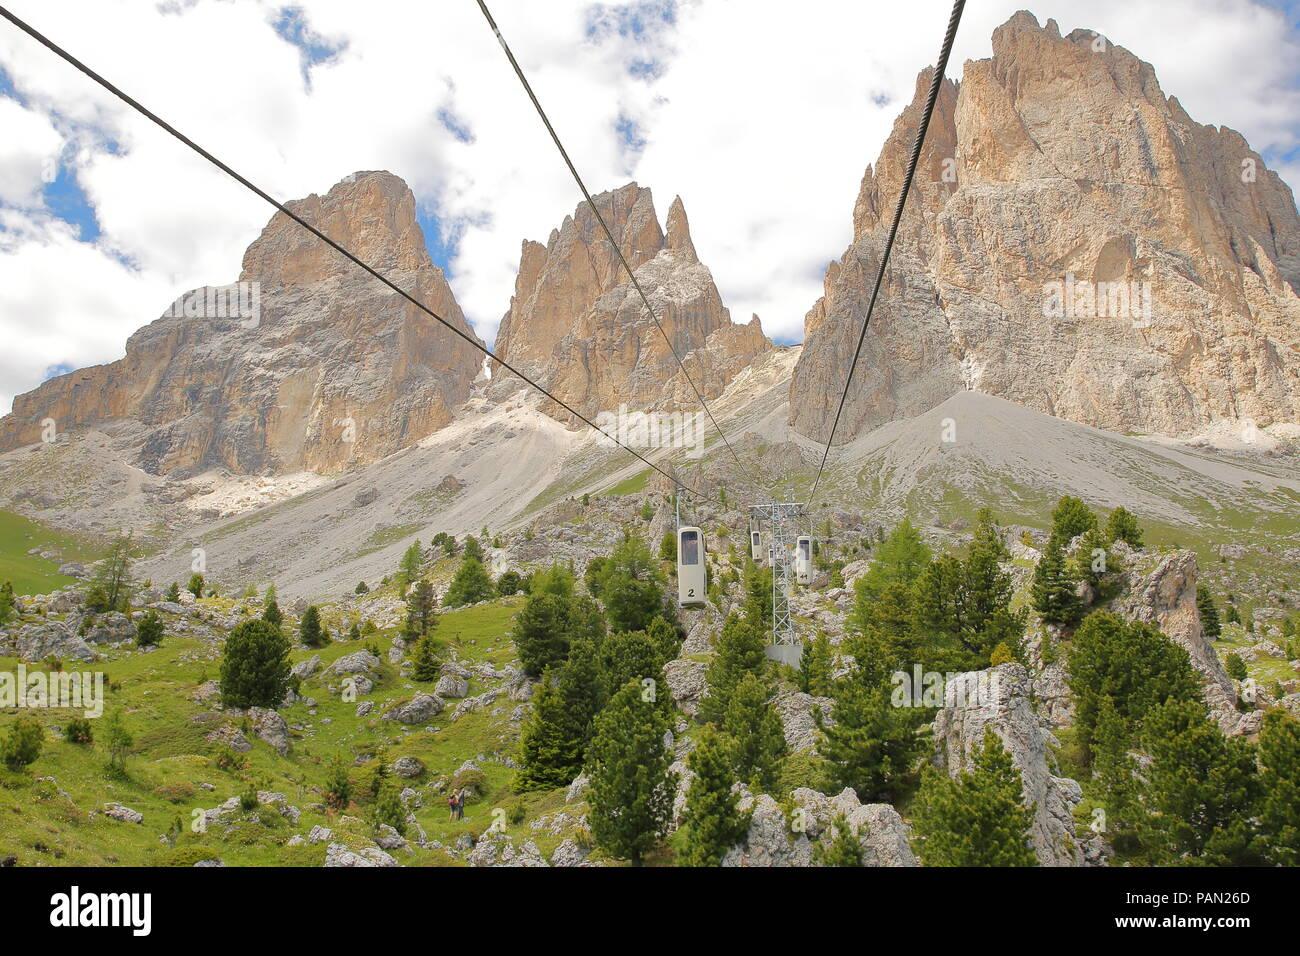 VAL GARDENA, ITALIE - 26 juin 2018: Sassolungo et Sassopiatto montagne vue de la Forcella Sassolungo cable car Photo Stock - Alamy